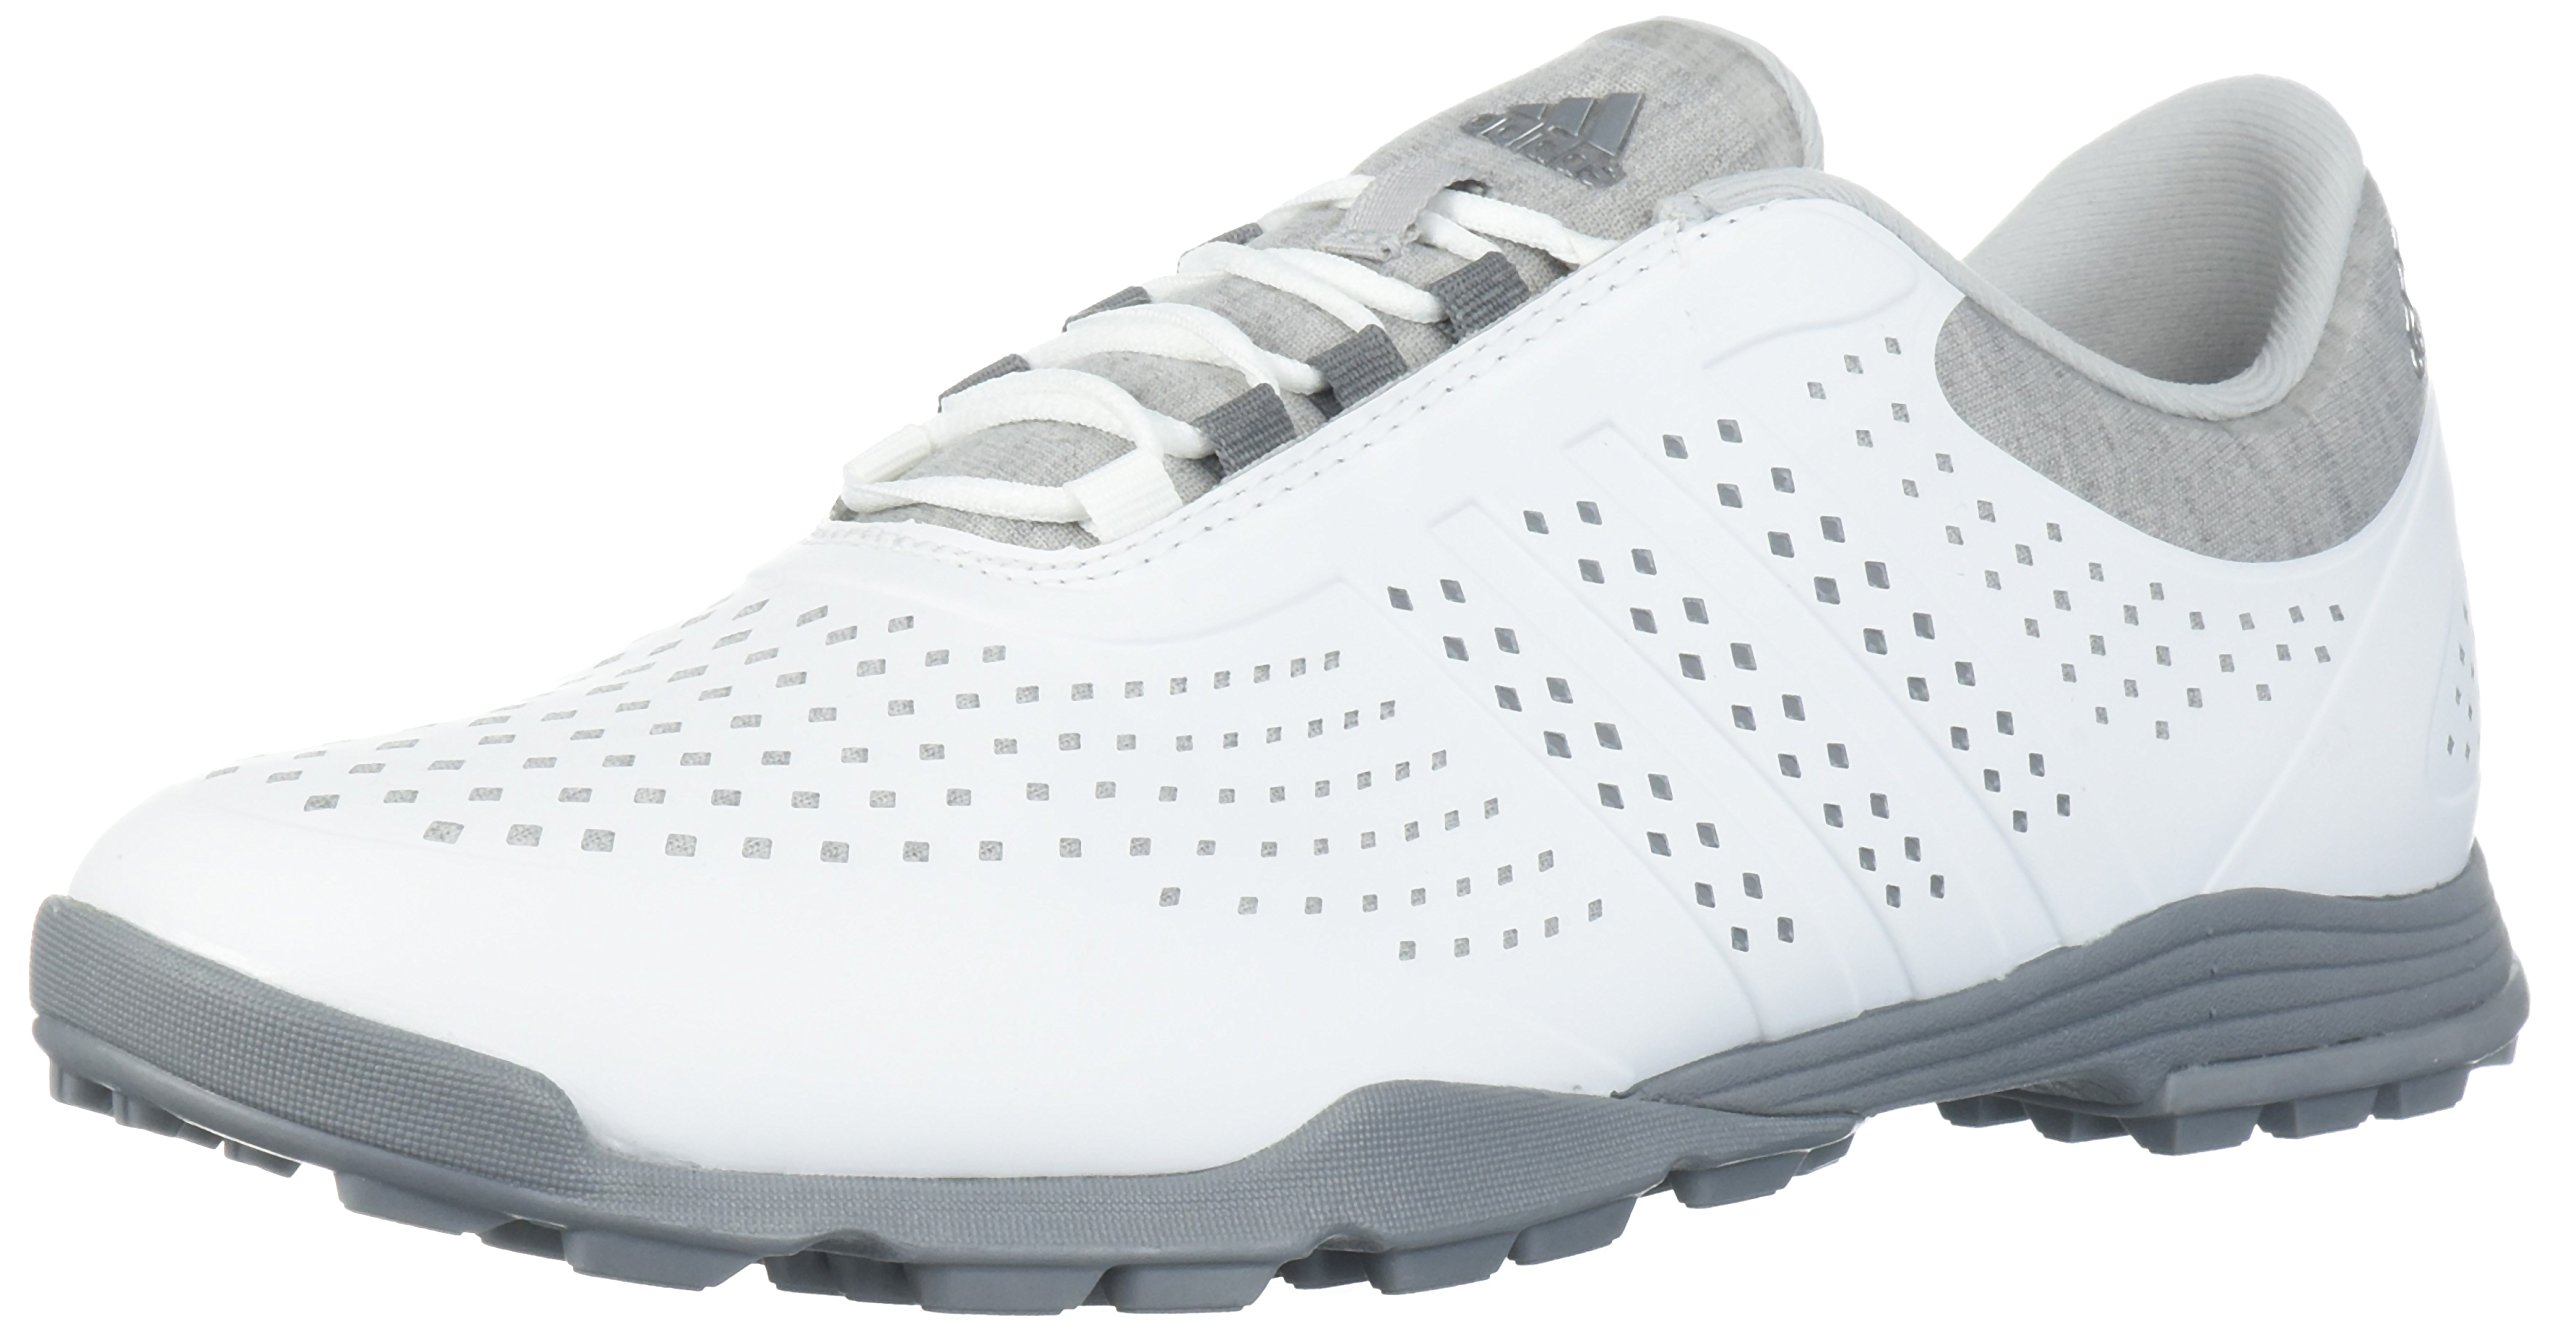 adidas Women's Adipure Sport Golf Shoe, White/Grey, 5 Medium US